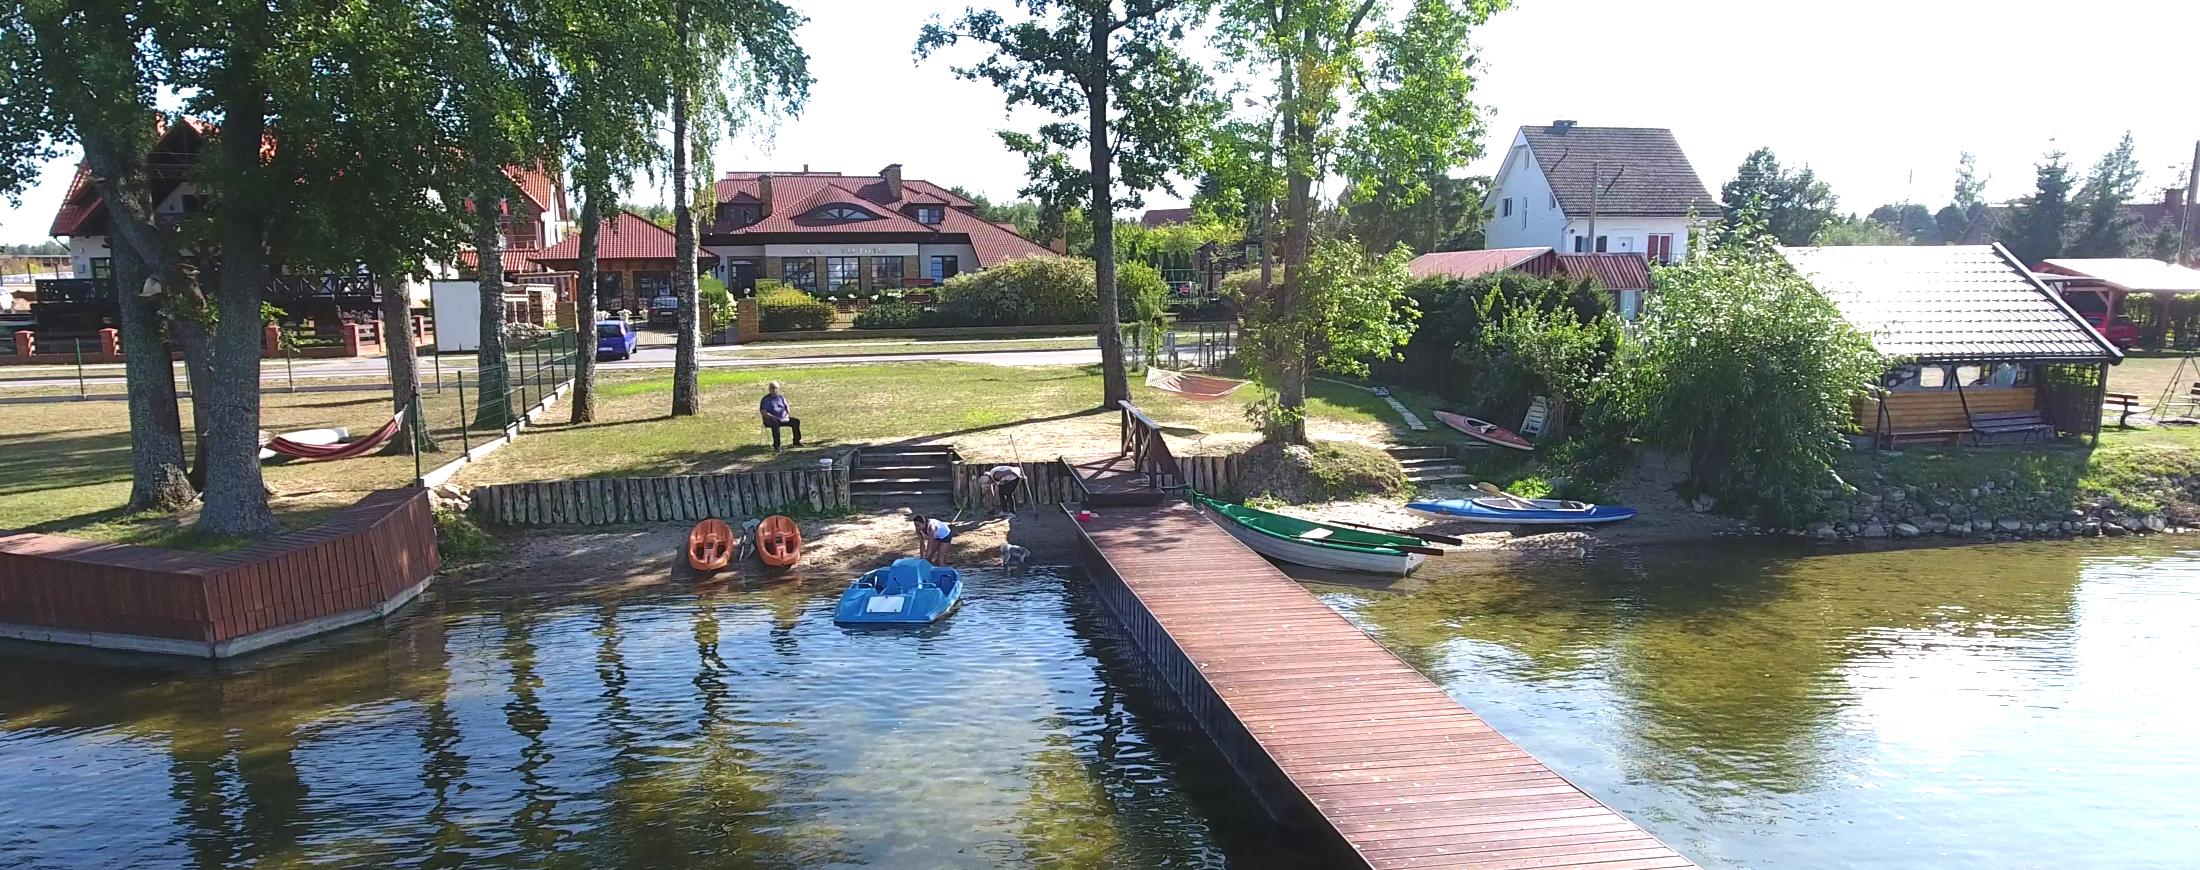 Villa Victoria Rydzewo, widok od-jeziora